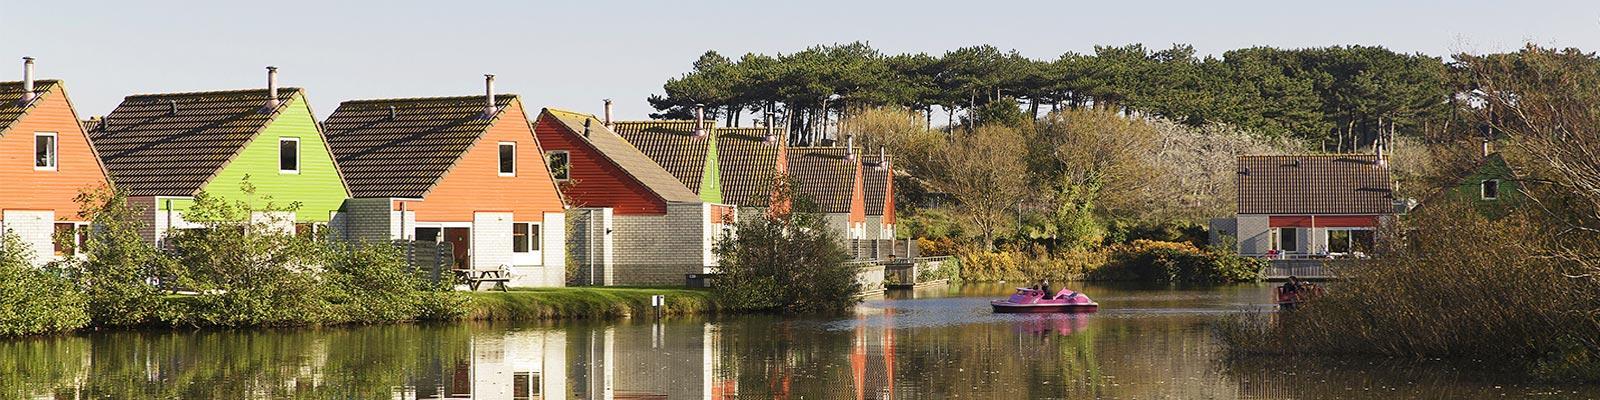 domaine Zandvoort, presque d'Amsterdam, aux Pays-Bas